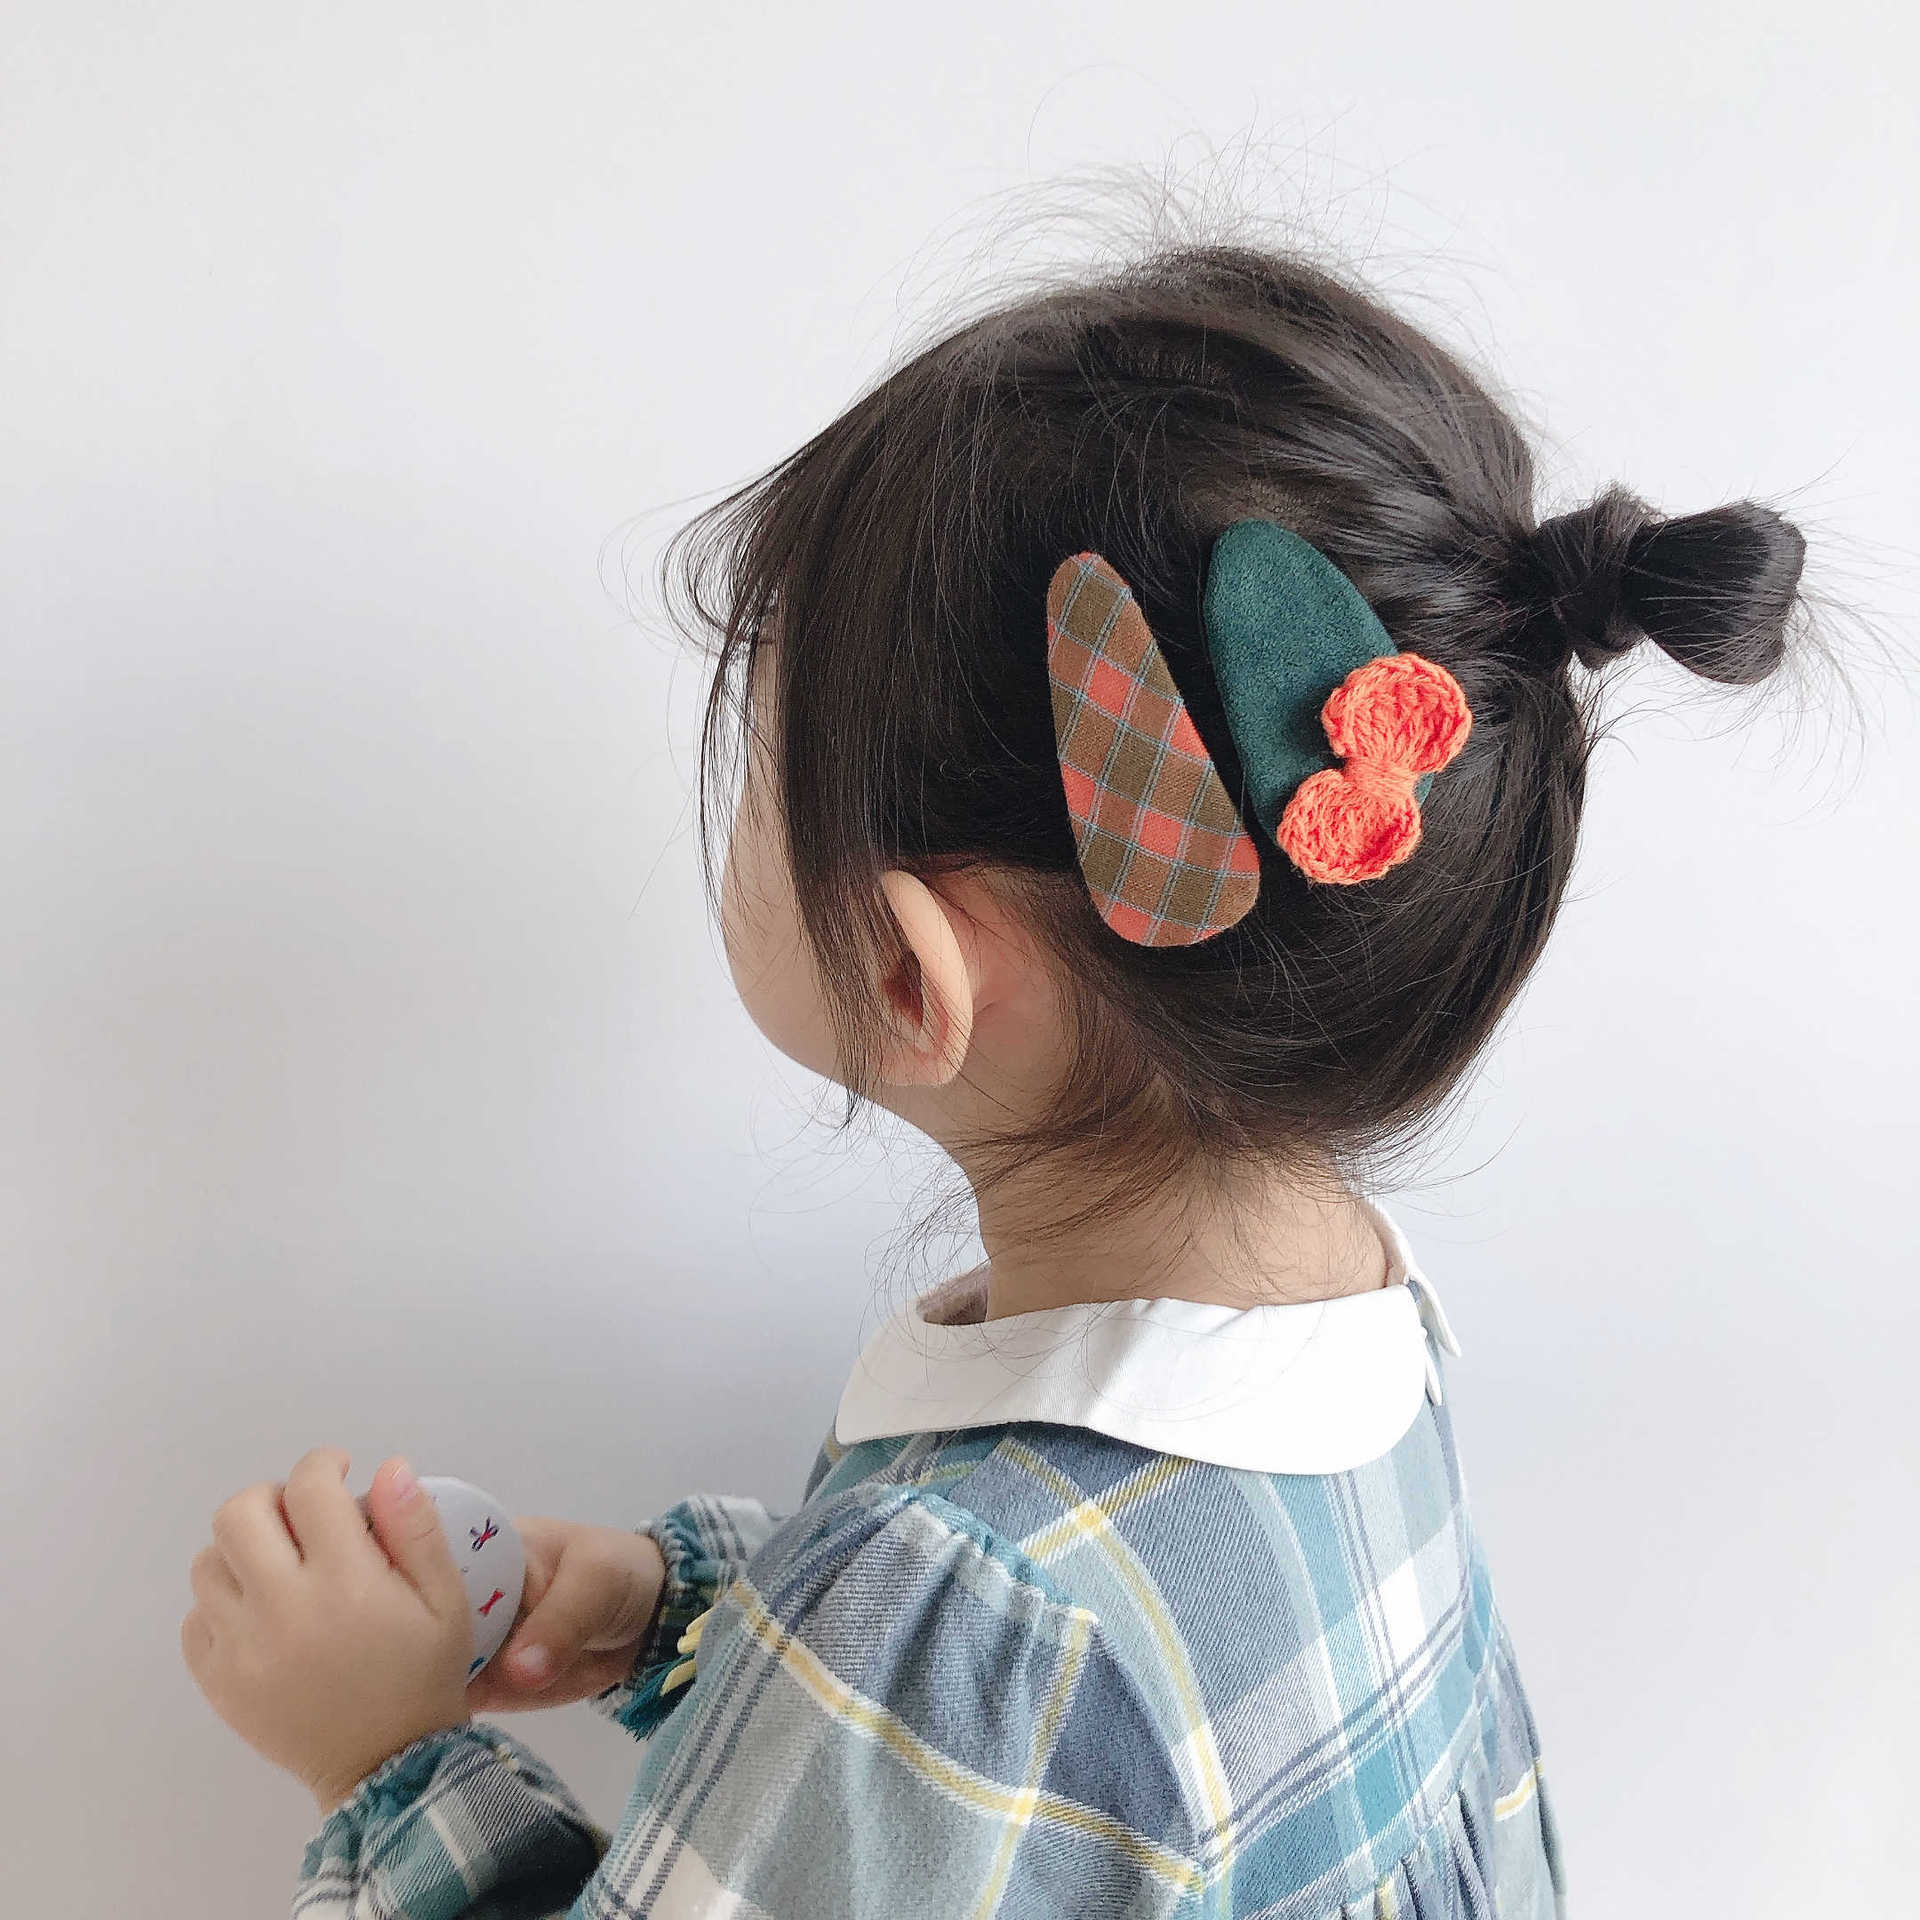 4Pcs/lot Fashion Water Droplet HairClips Cute Yarn Bow Children Girly Set BB Baby Girls Hair Clip Hair Accessories Headdress